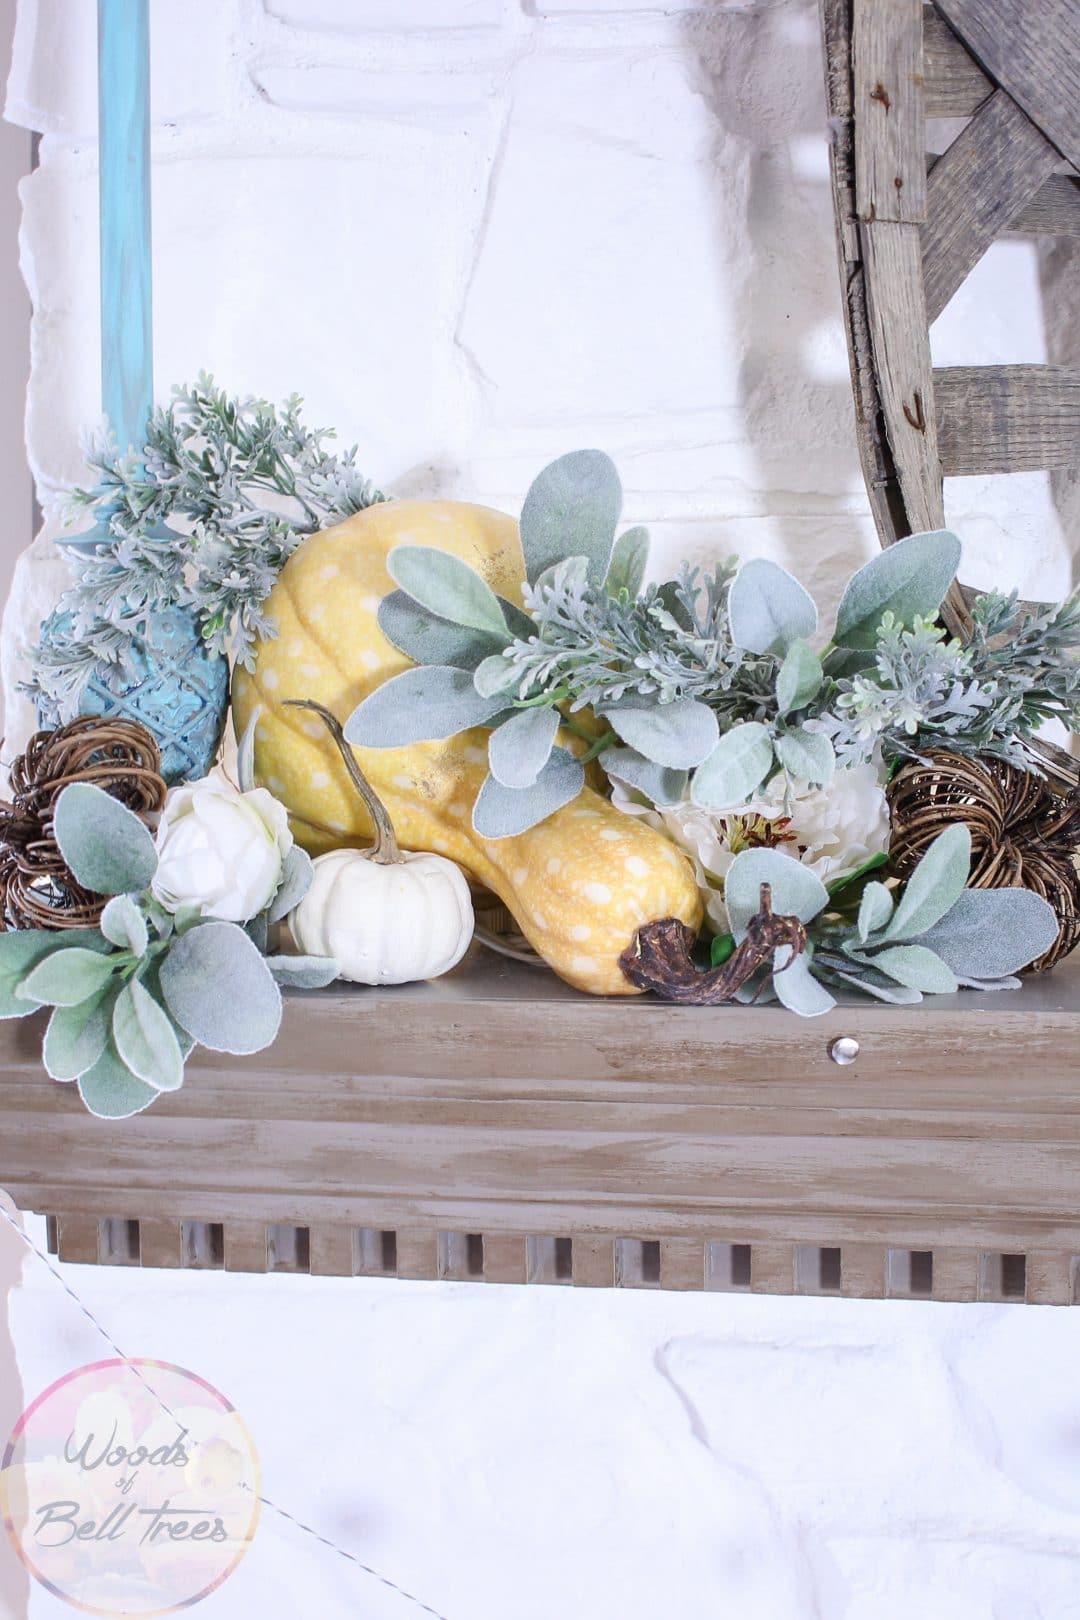 fall-mantel-mantle-decor-neutral-simple-diy-home-cozy-easy-autumn-natural-2-1080x1620